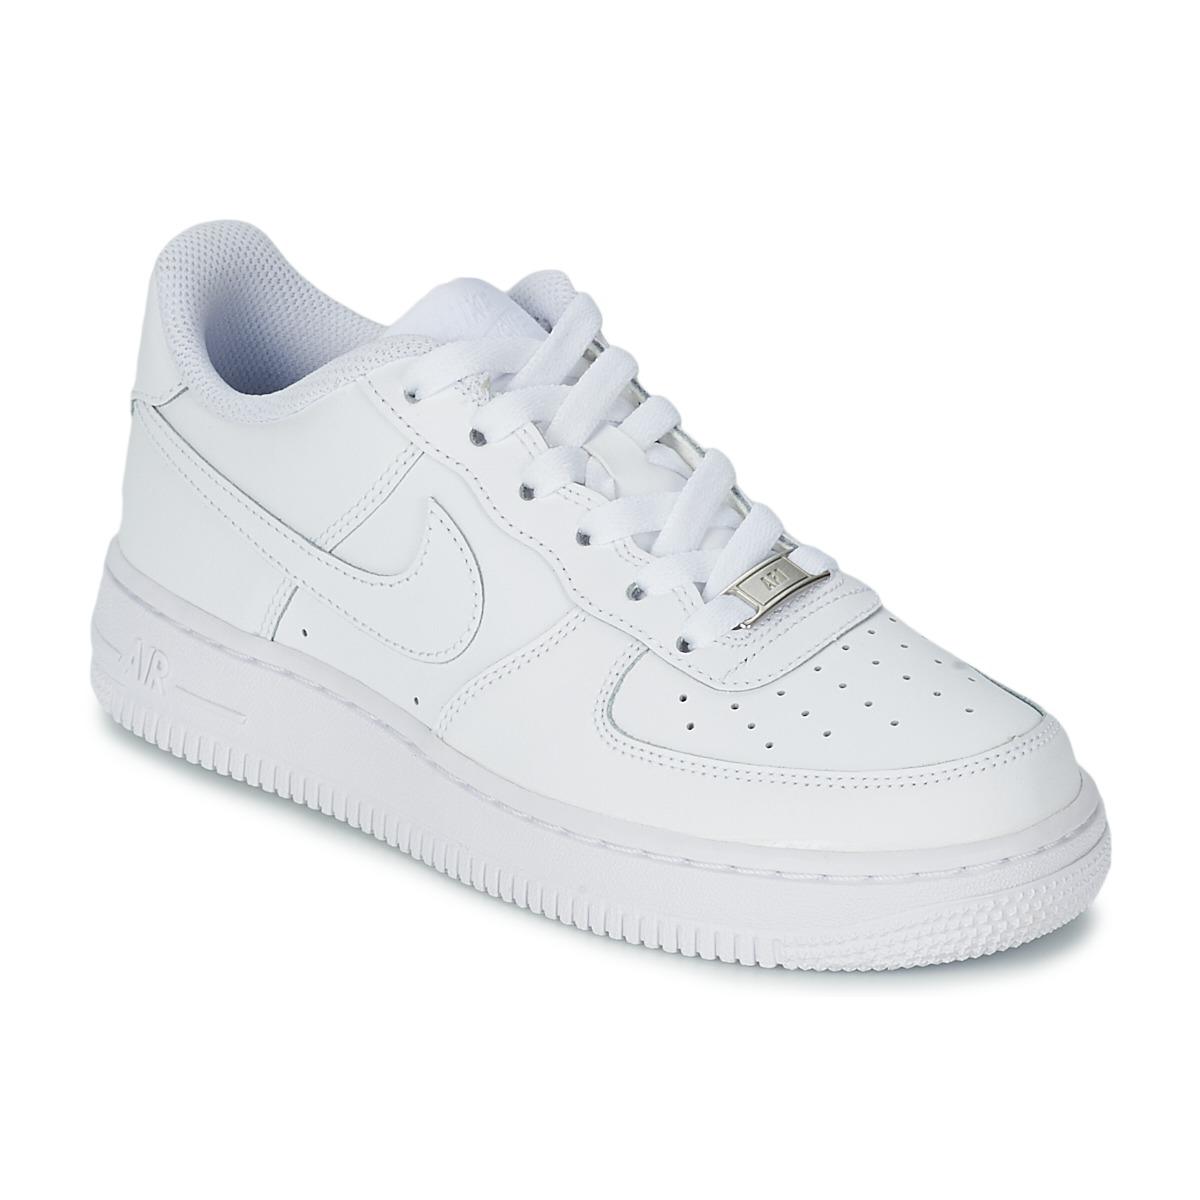 97+ Nike Air Force 1 Big Kids Shoe Nike Com. Nike Air Force 1 07 ... 5ac276039e0